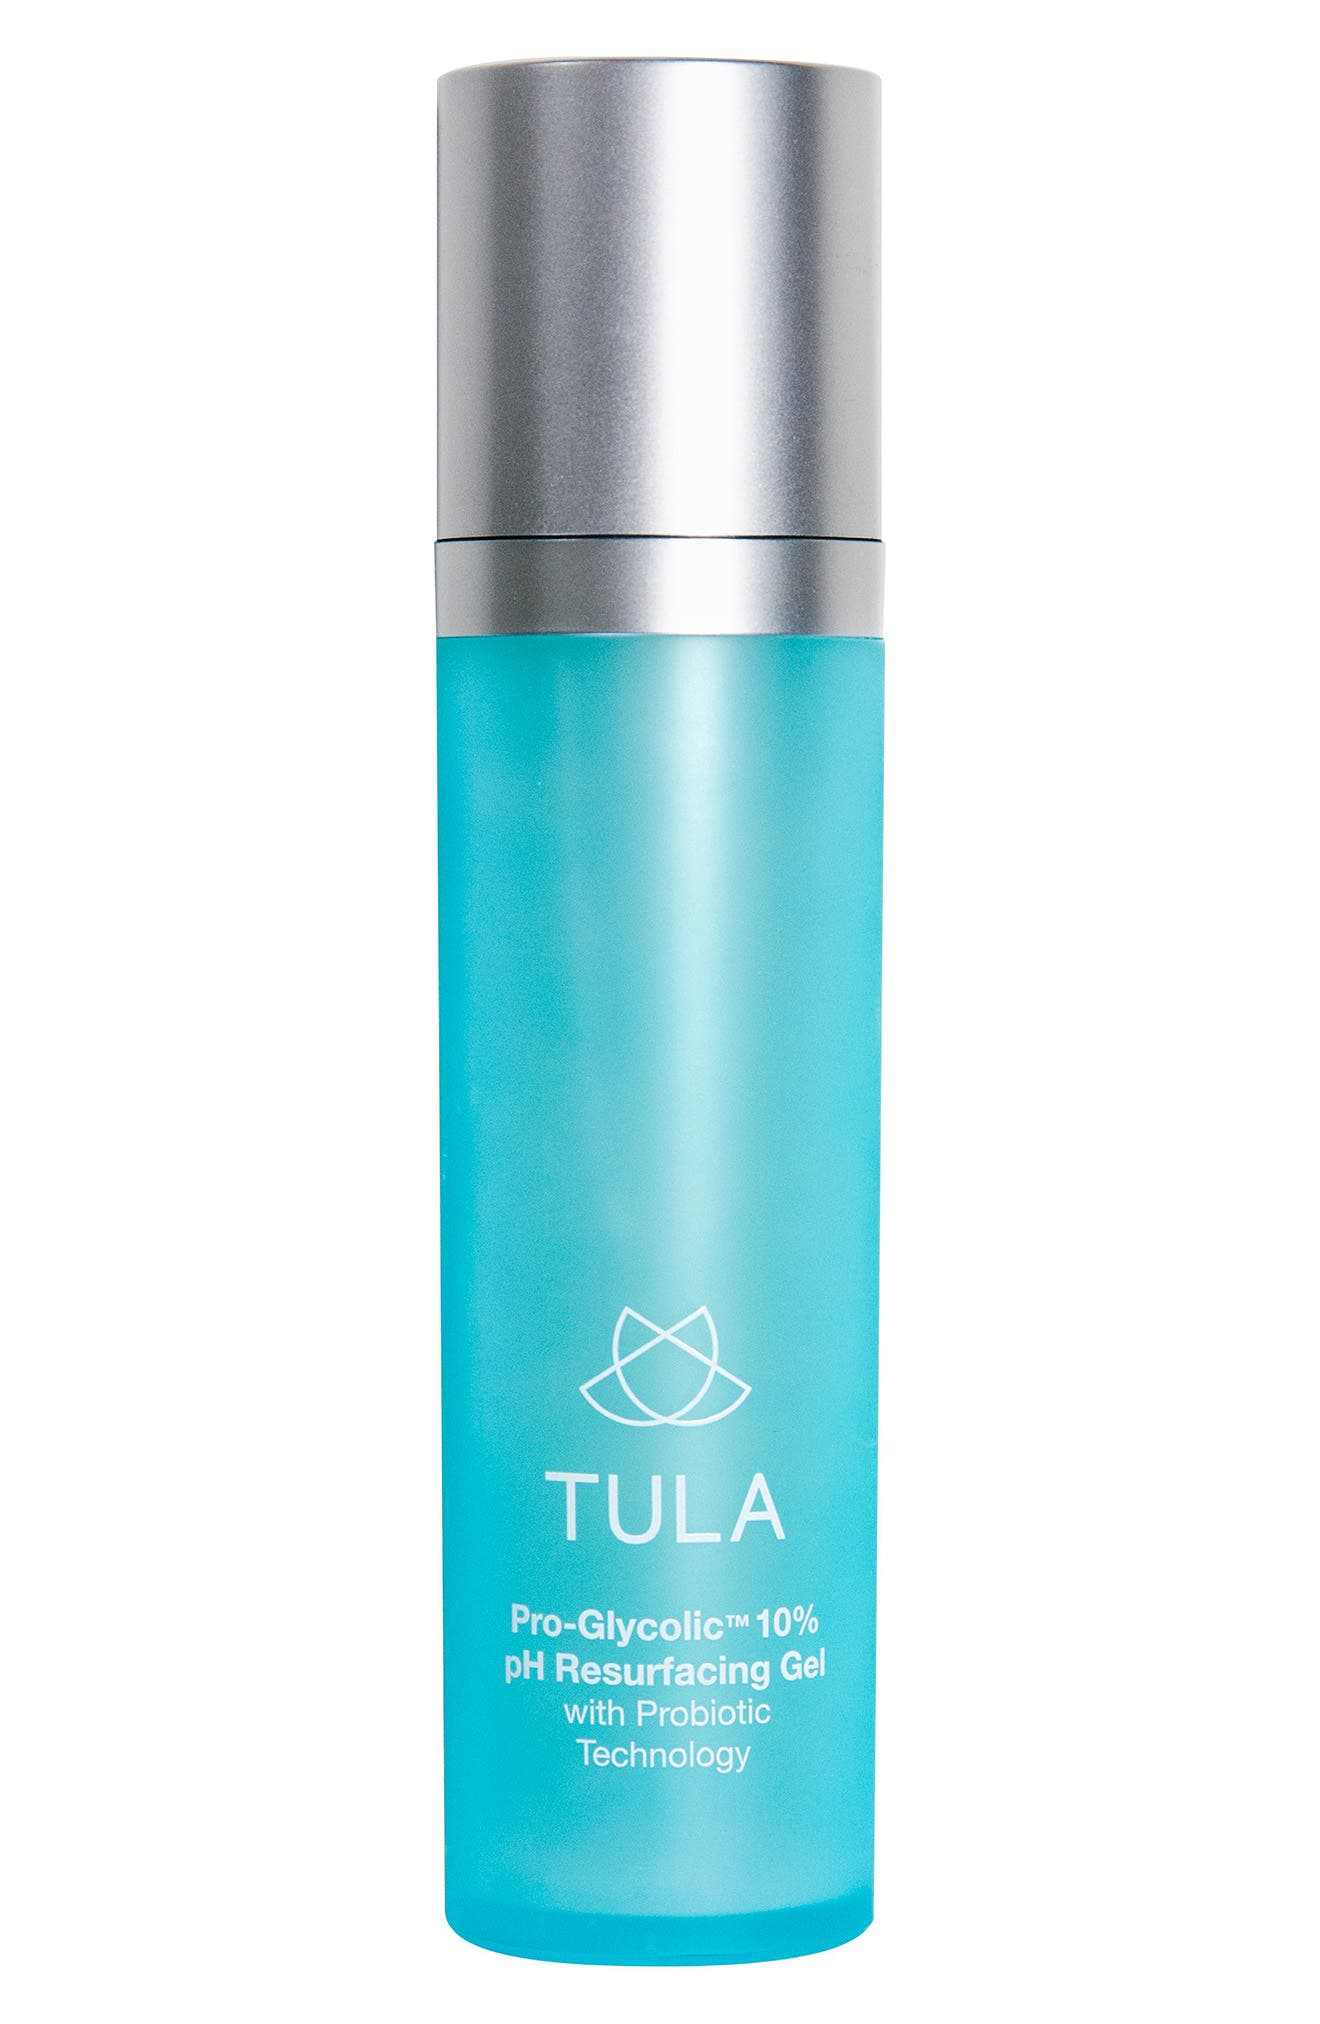 Main Image - Tula Probiotic Skincare Pro-Glycolic™ 10% pH Resurfacing Gel